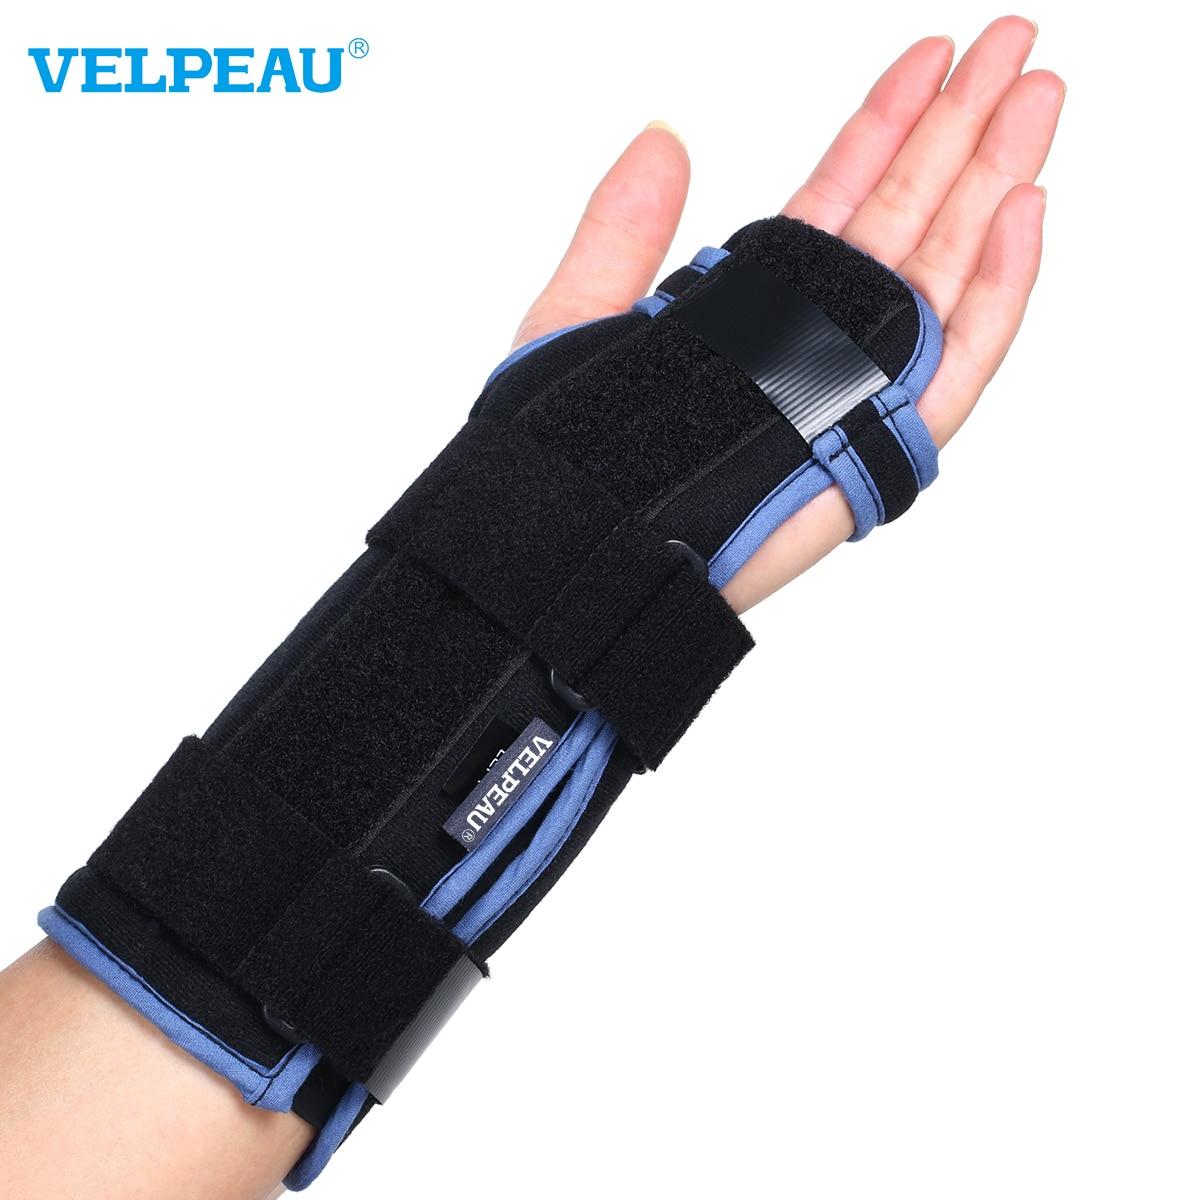 VELPEAU-전문 손목 보호대, 손목 염좌, 관절염, 골절, 골절 회복 사용, 석고 후 충전 없음